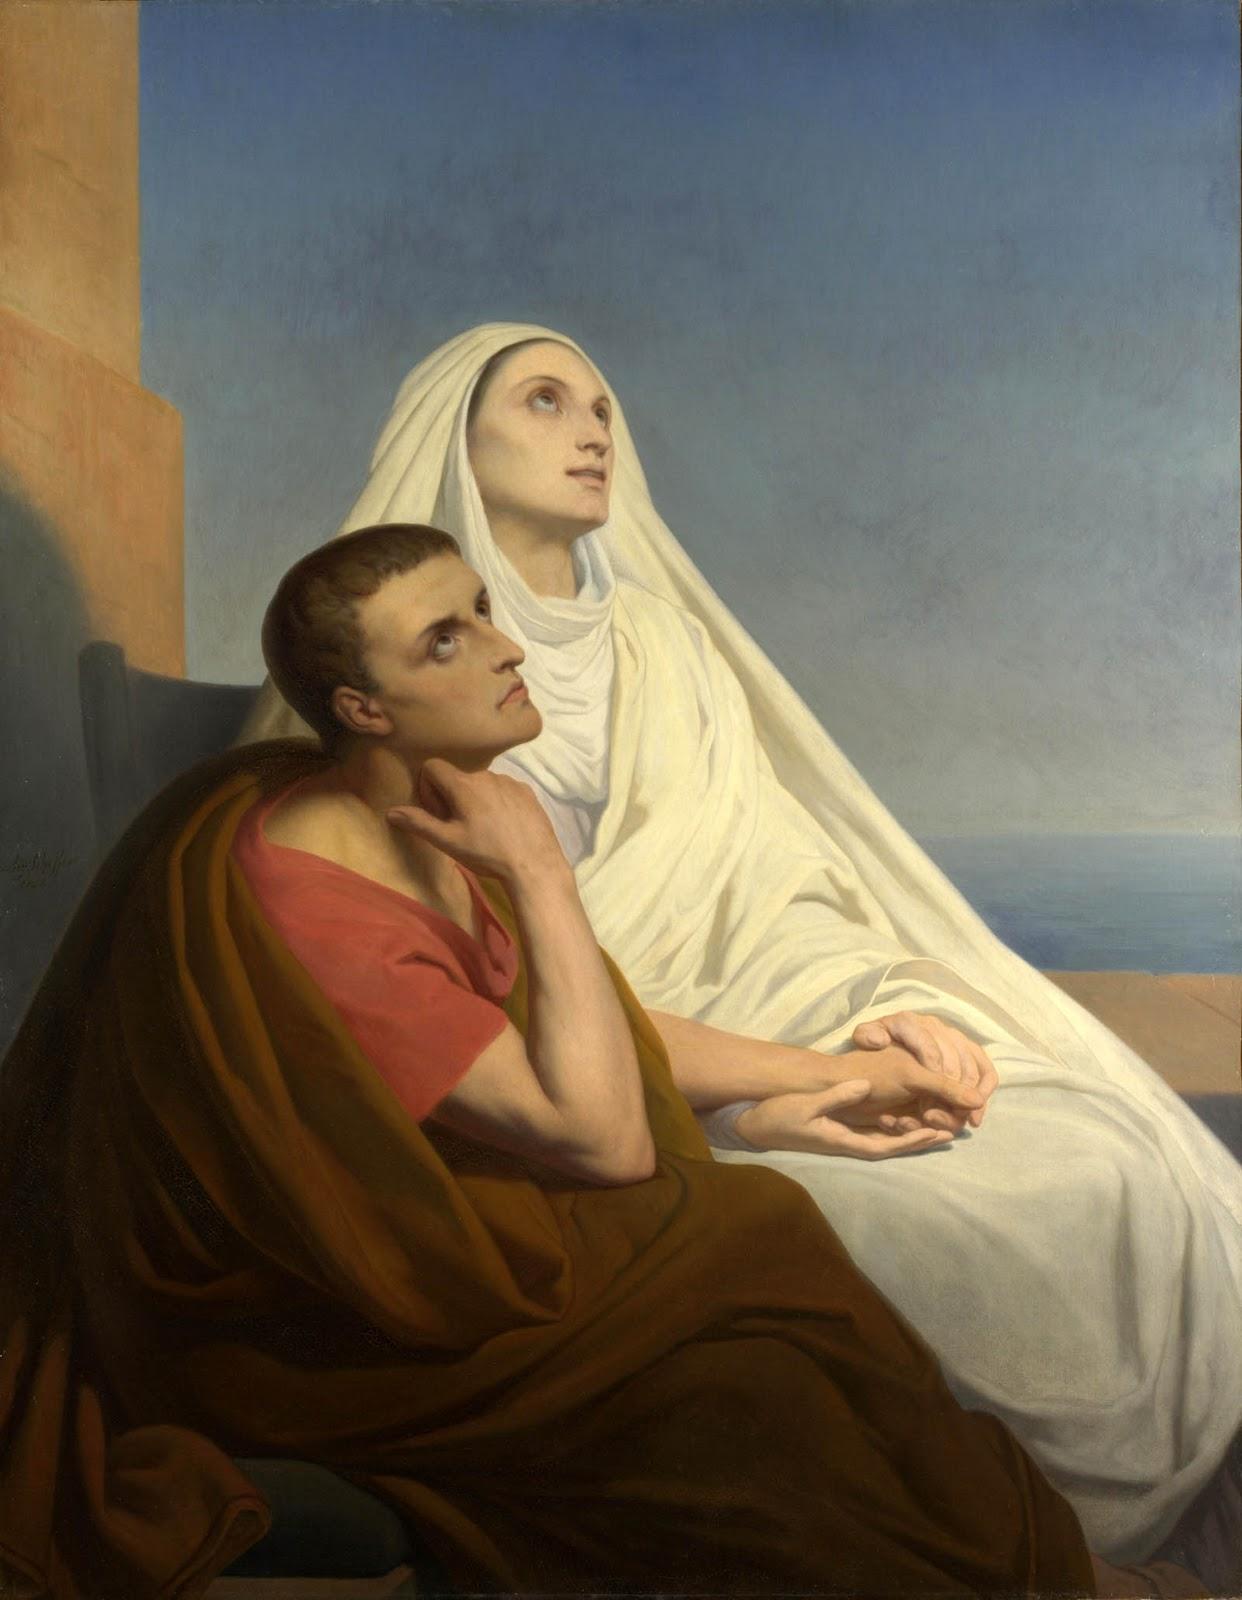 Miguel Angel, San Agustín, religión, filosofía, pintura